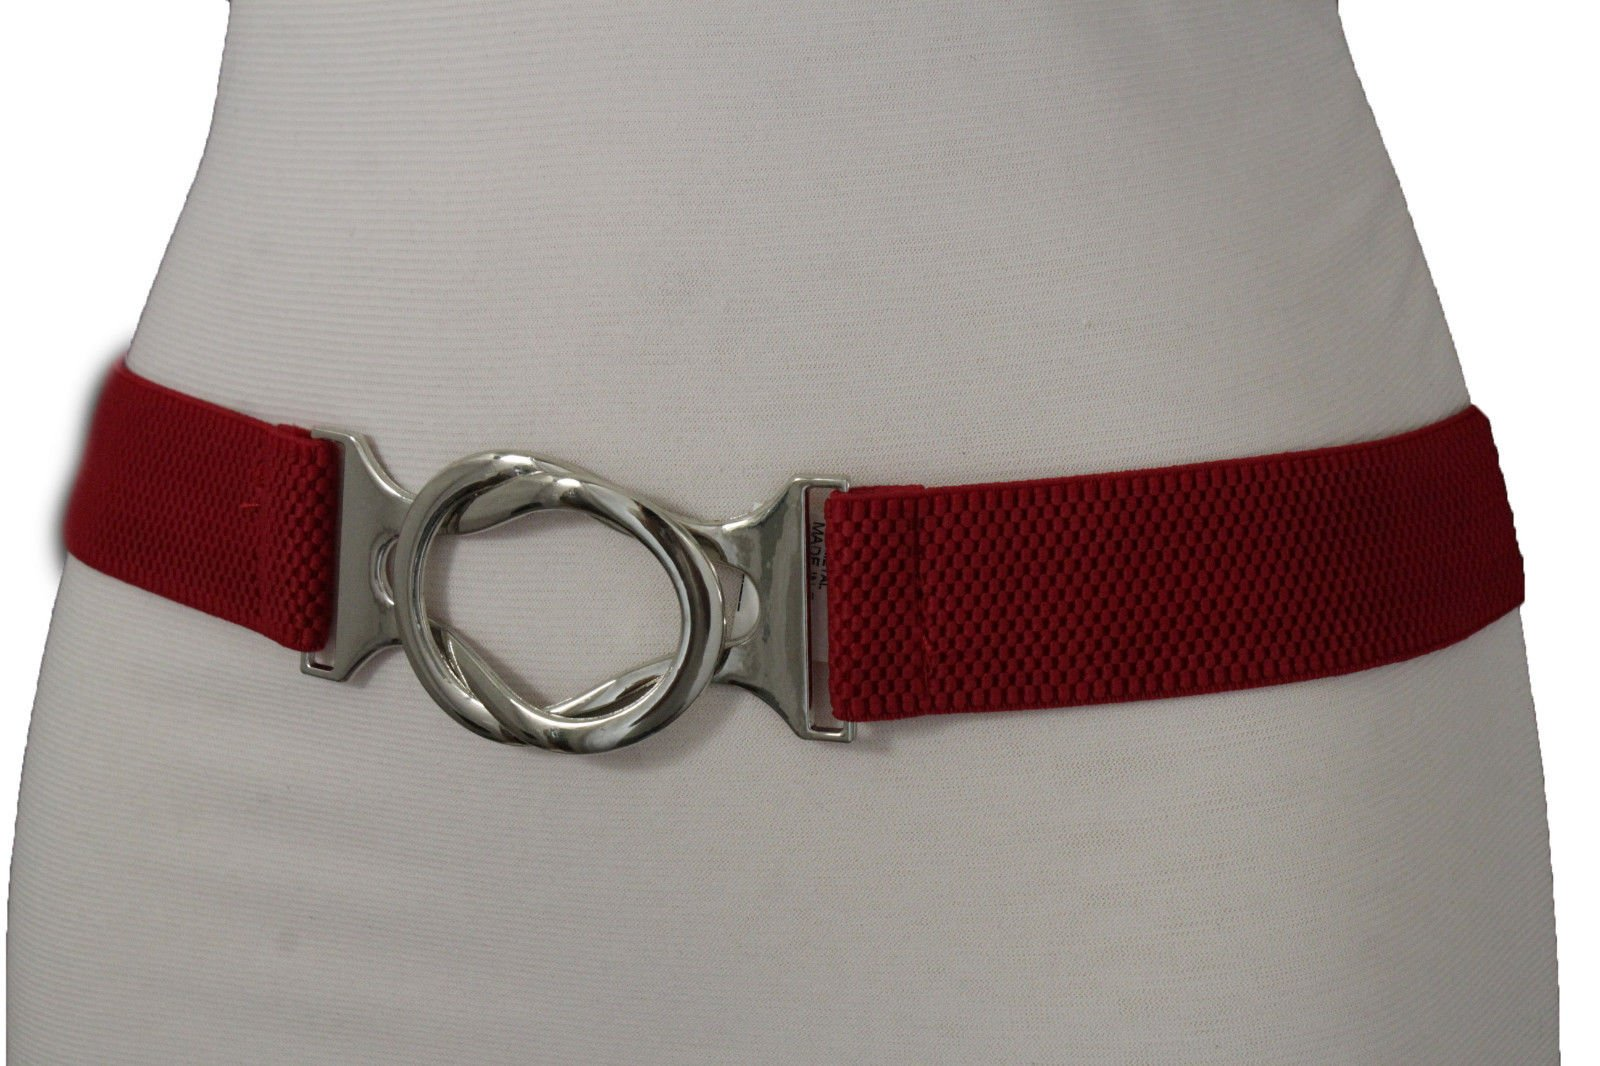 TFJ Women Fashion Silver Buckle Belt Hip Waist Skinny Elastic Band One Size S M Red